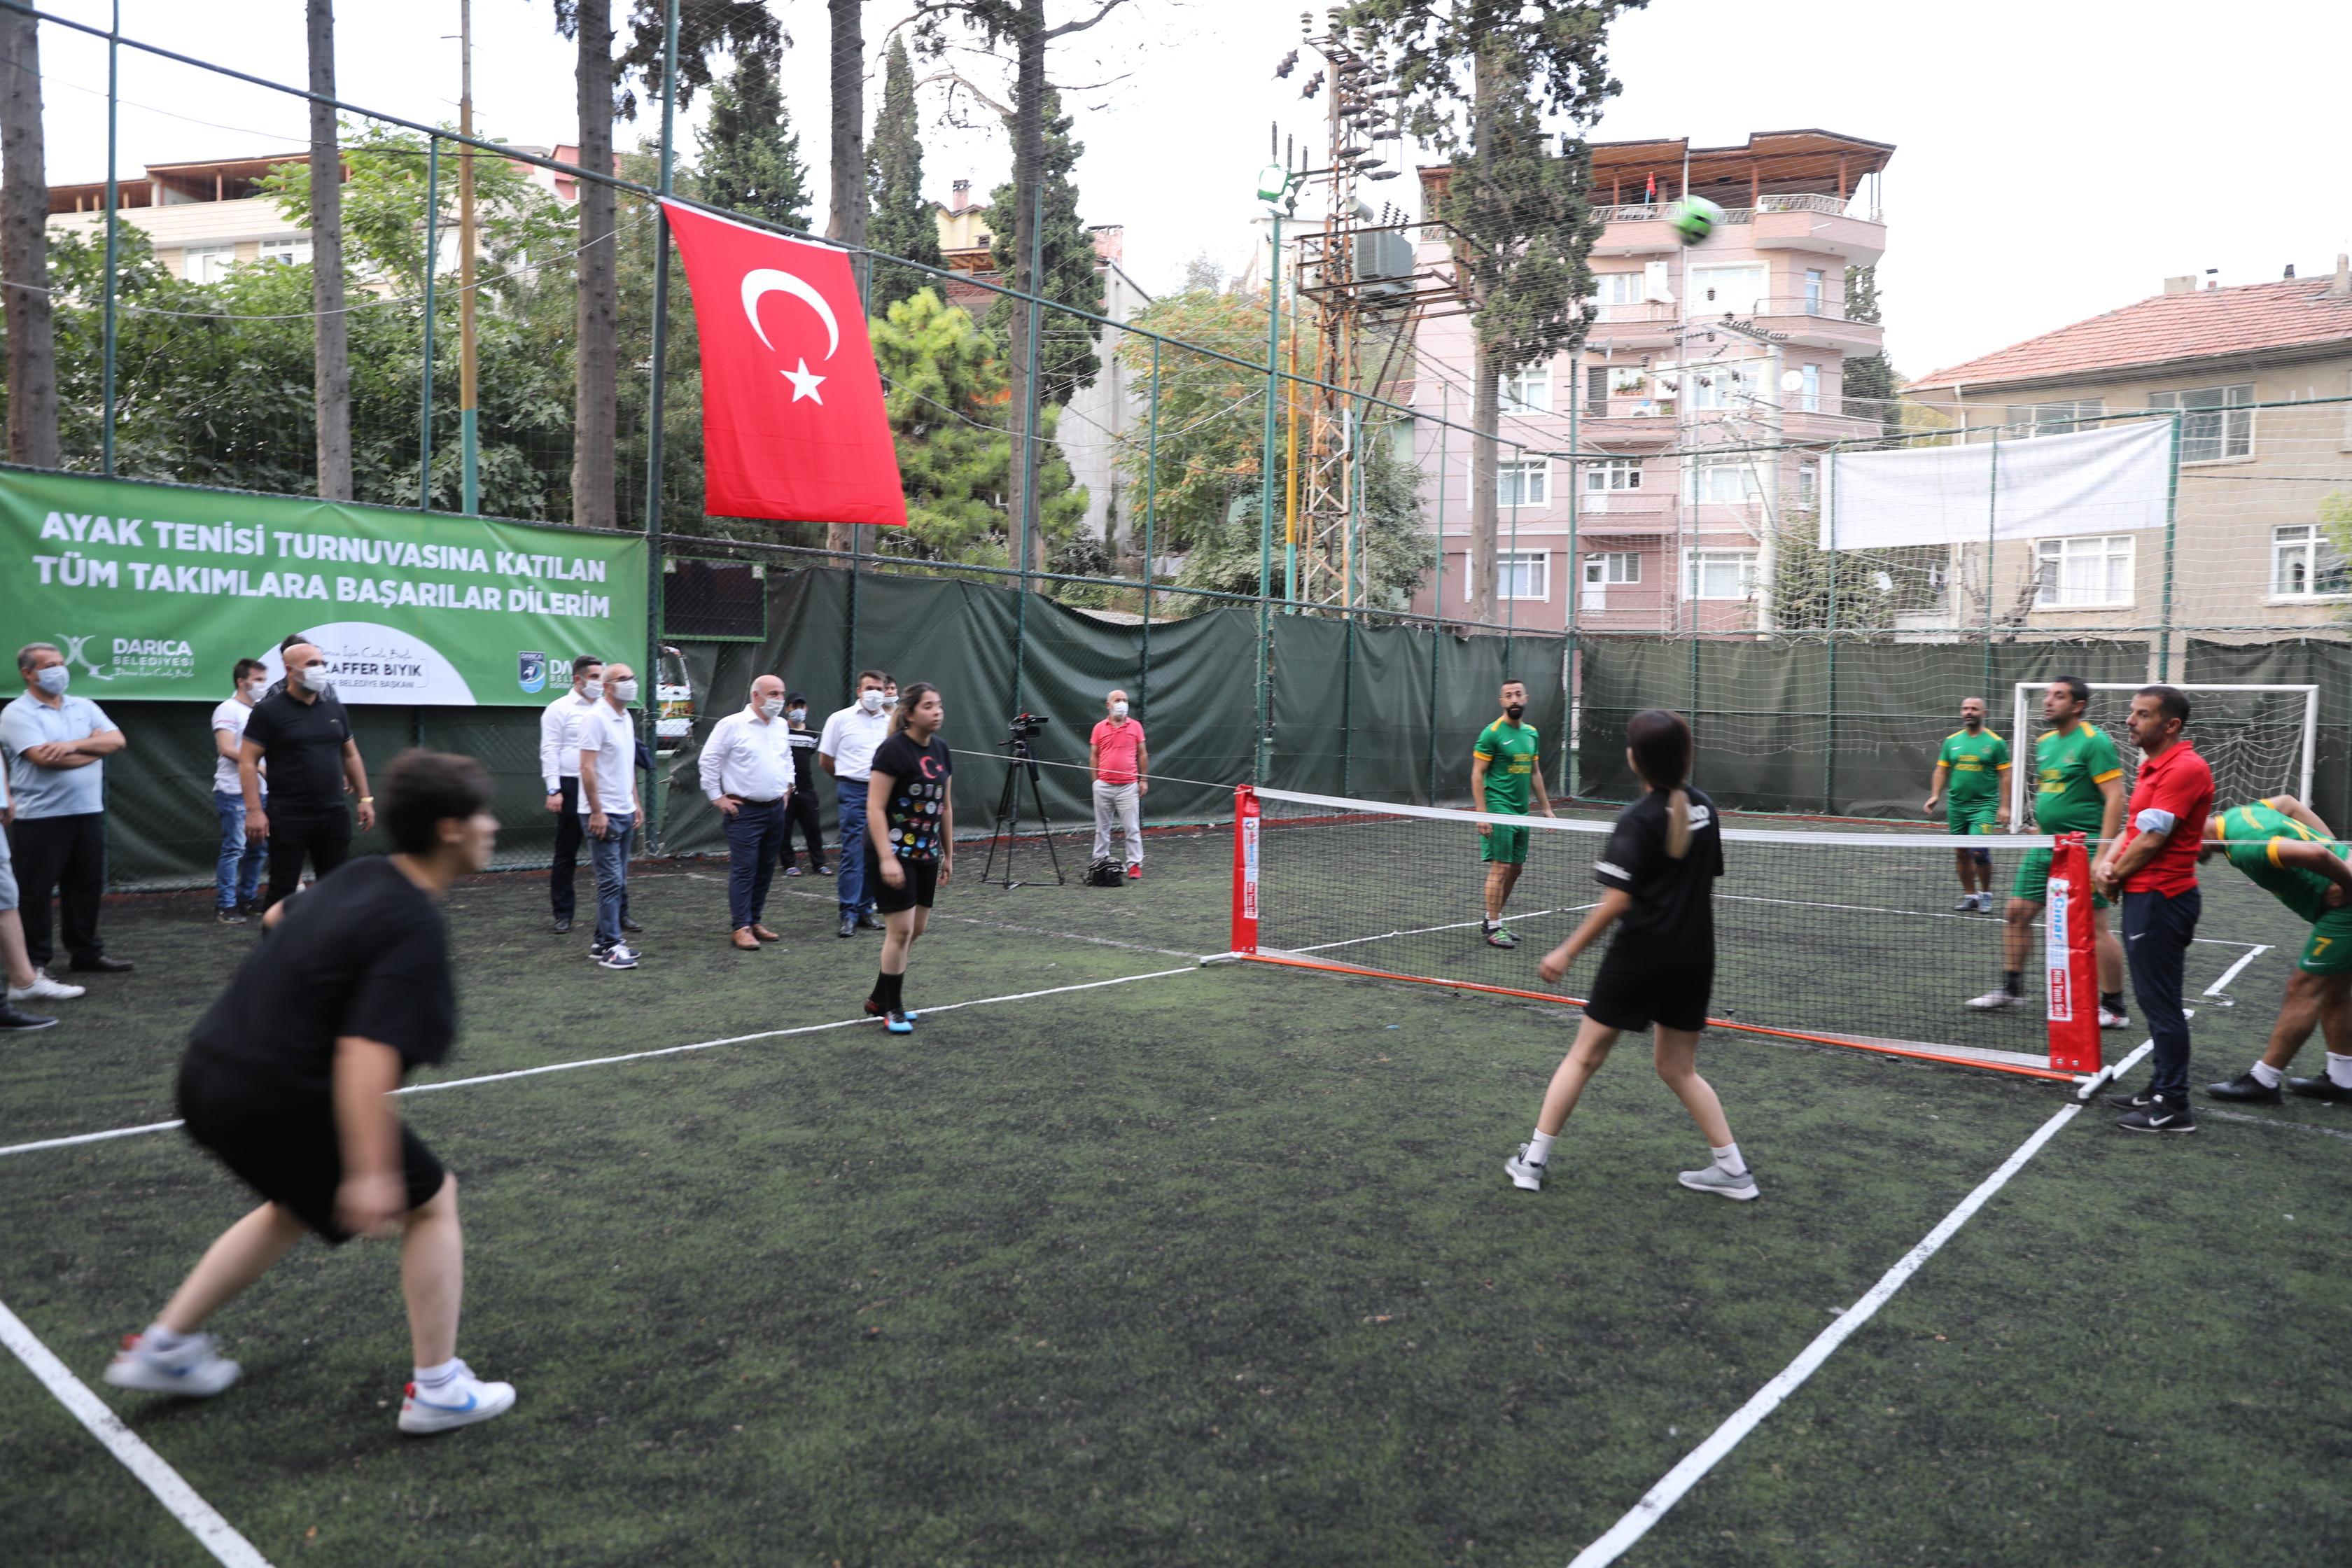 darica'da-sosyal-mesafeli-ayak-tenisi-turnuvasi-basladi-(4).jpg